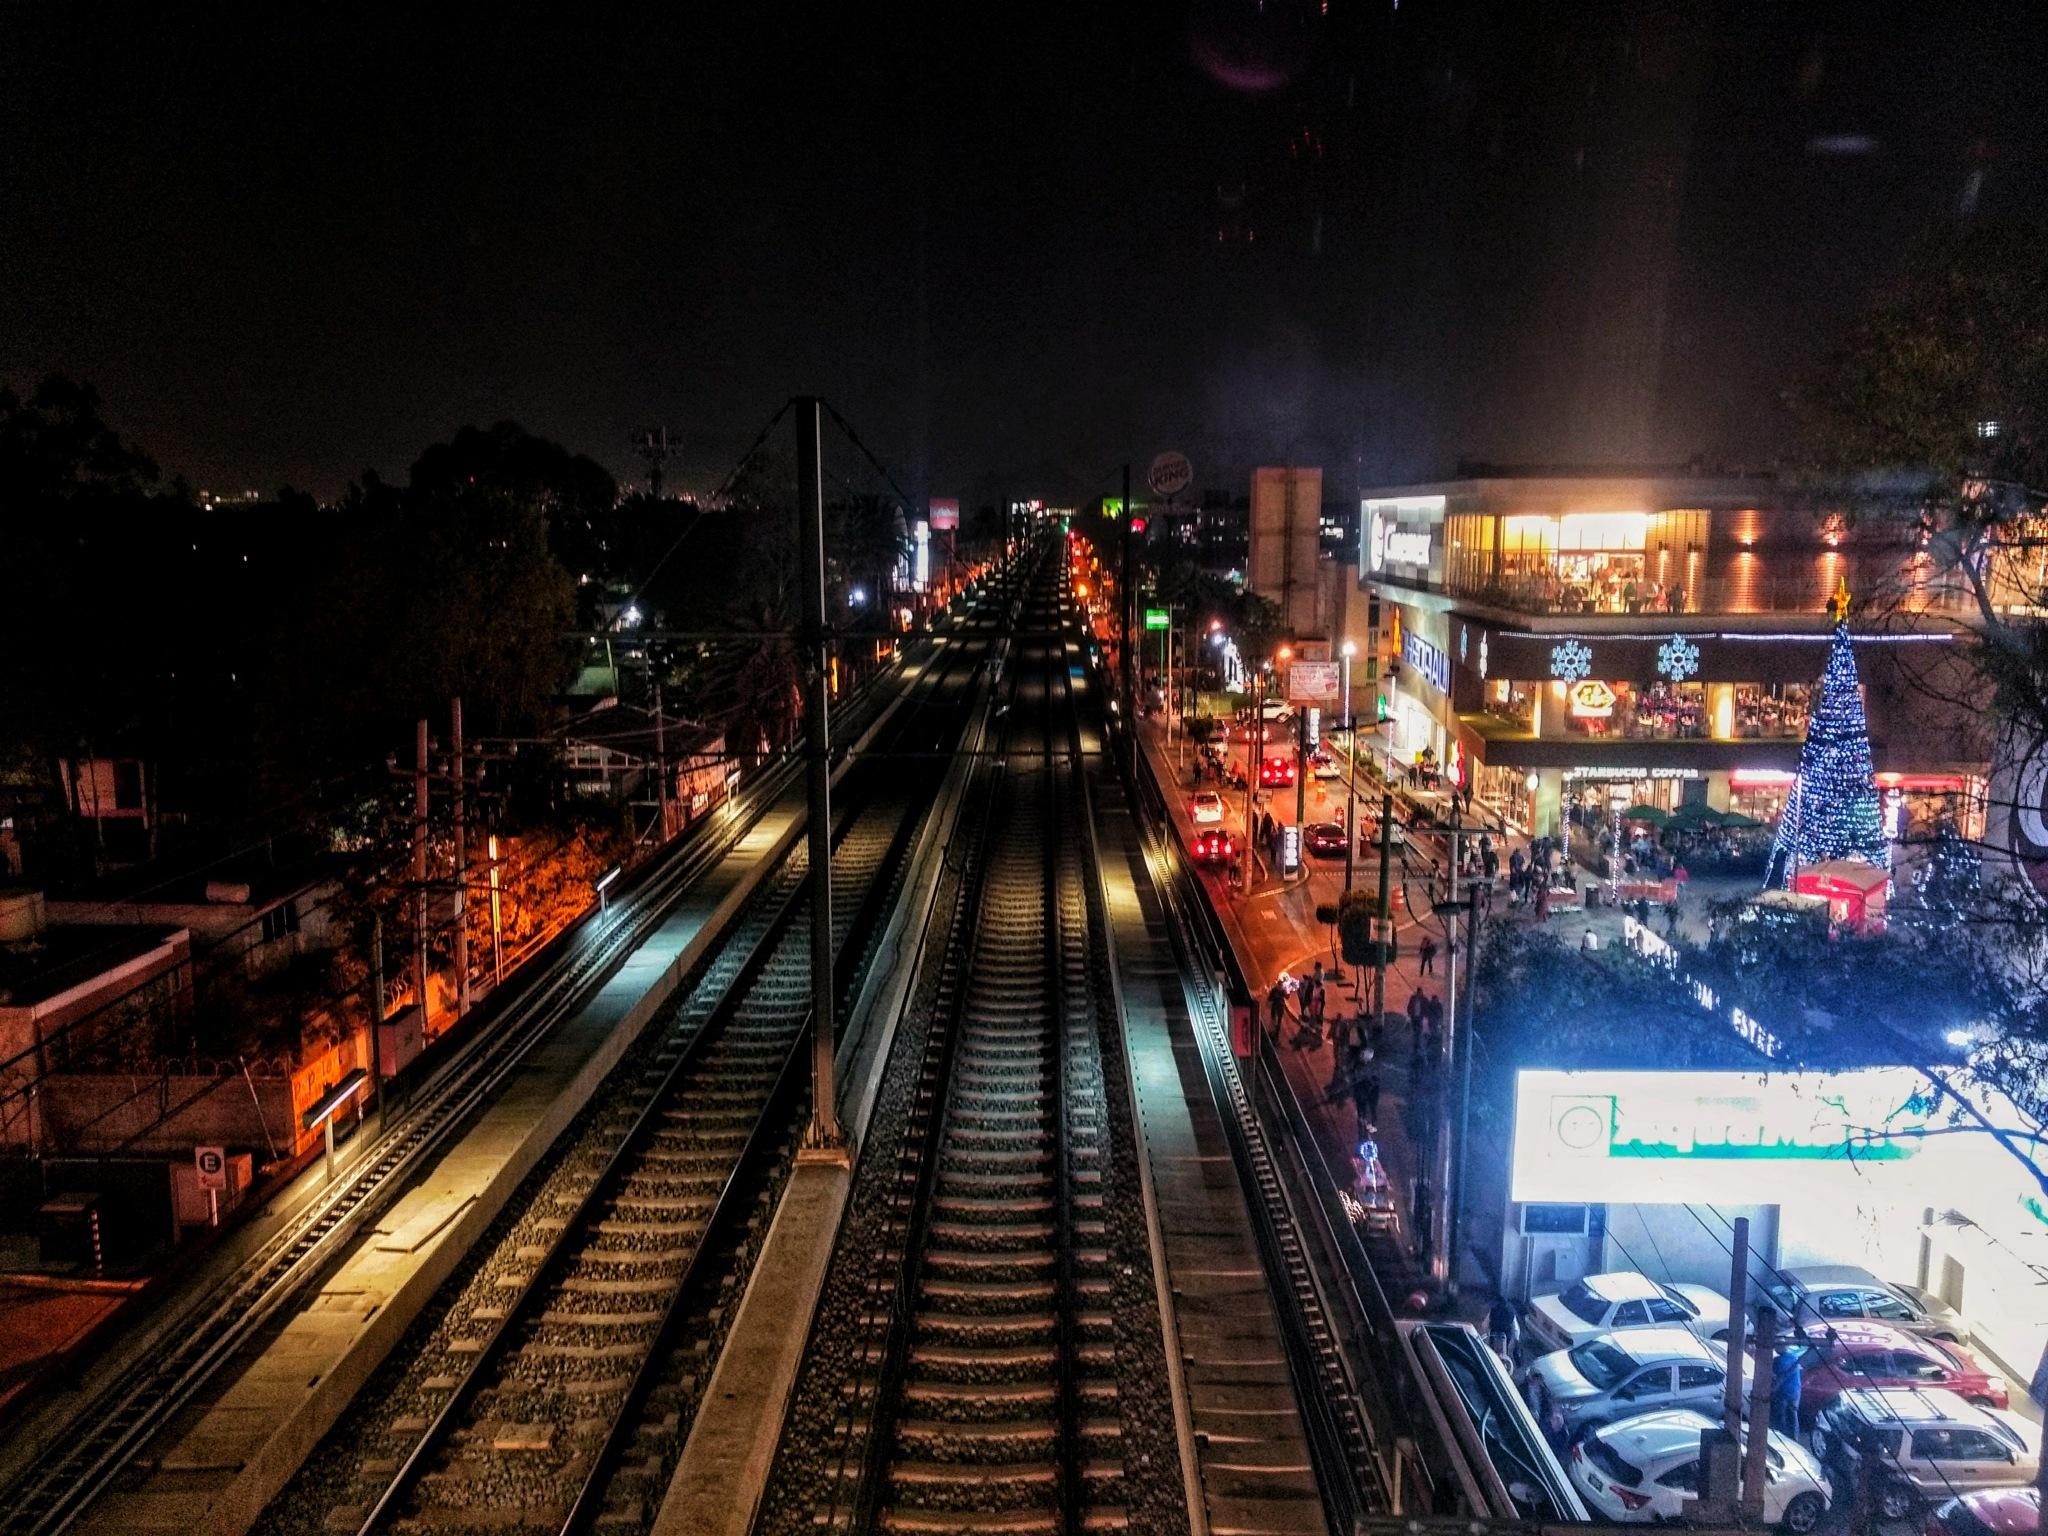 viaje nocturno by Sebastian Betancourt